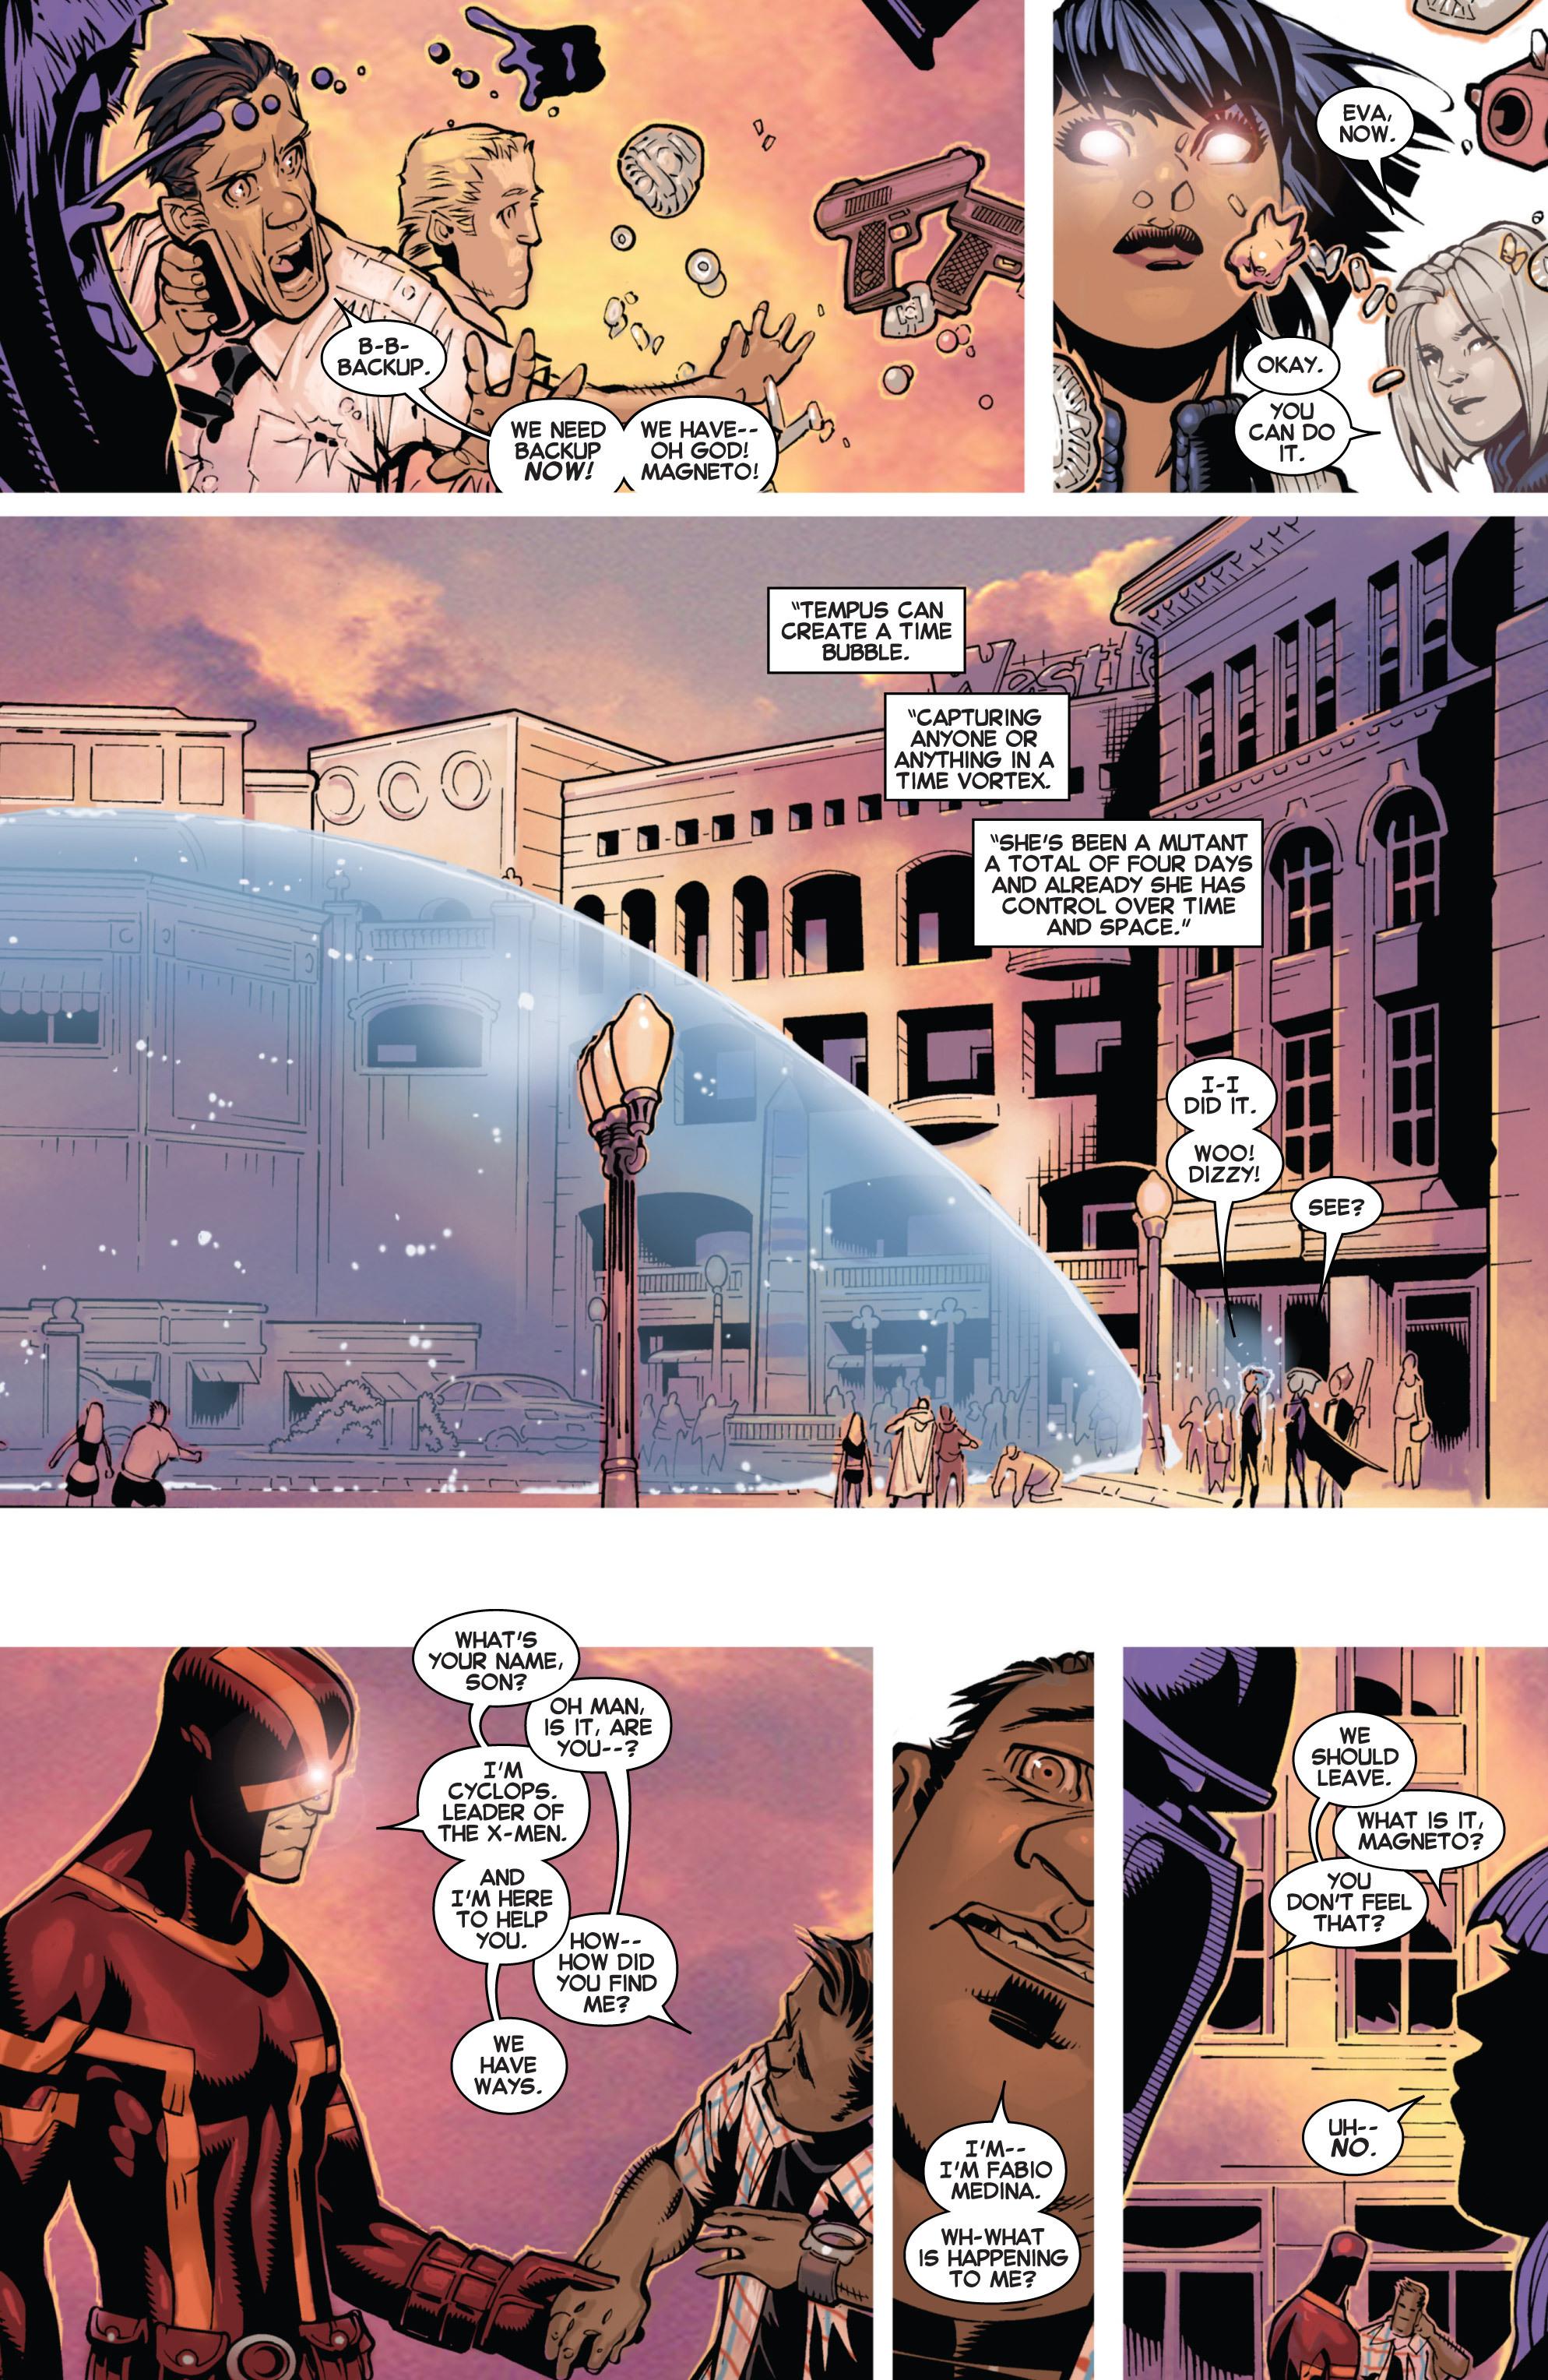 Read online Uncanny X-Men (2013) comic -  Issue # _TPB 1 - Revolution - 14